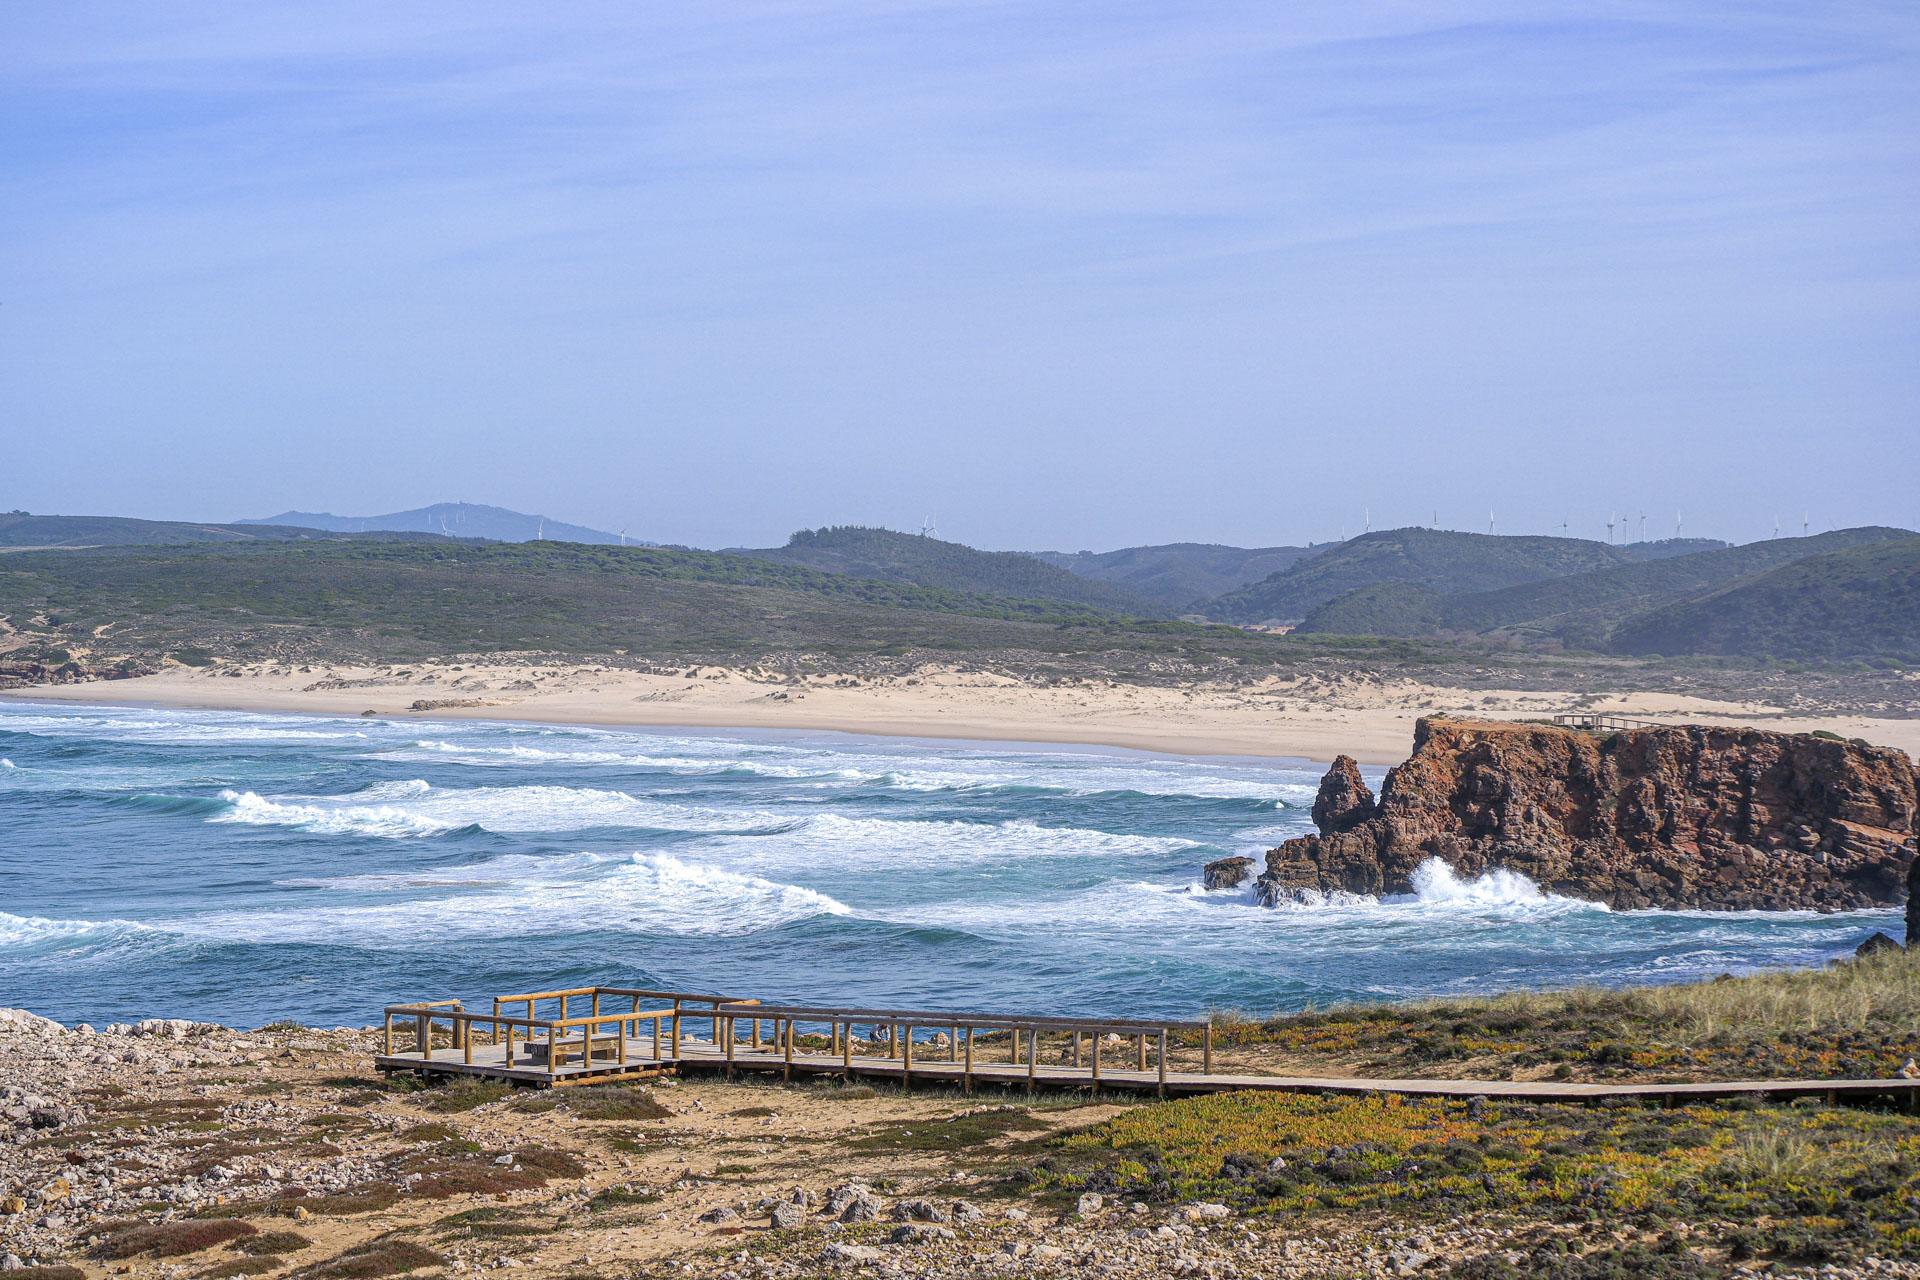 Ontdek-de-Algarve-Portugal-Apollo-Travel-reisbureau-Deinze-web